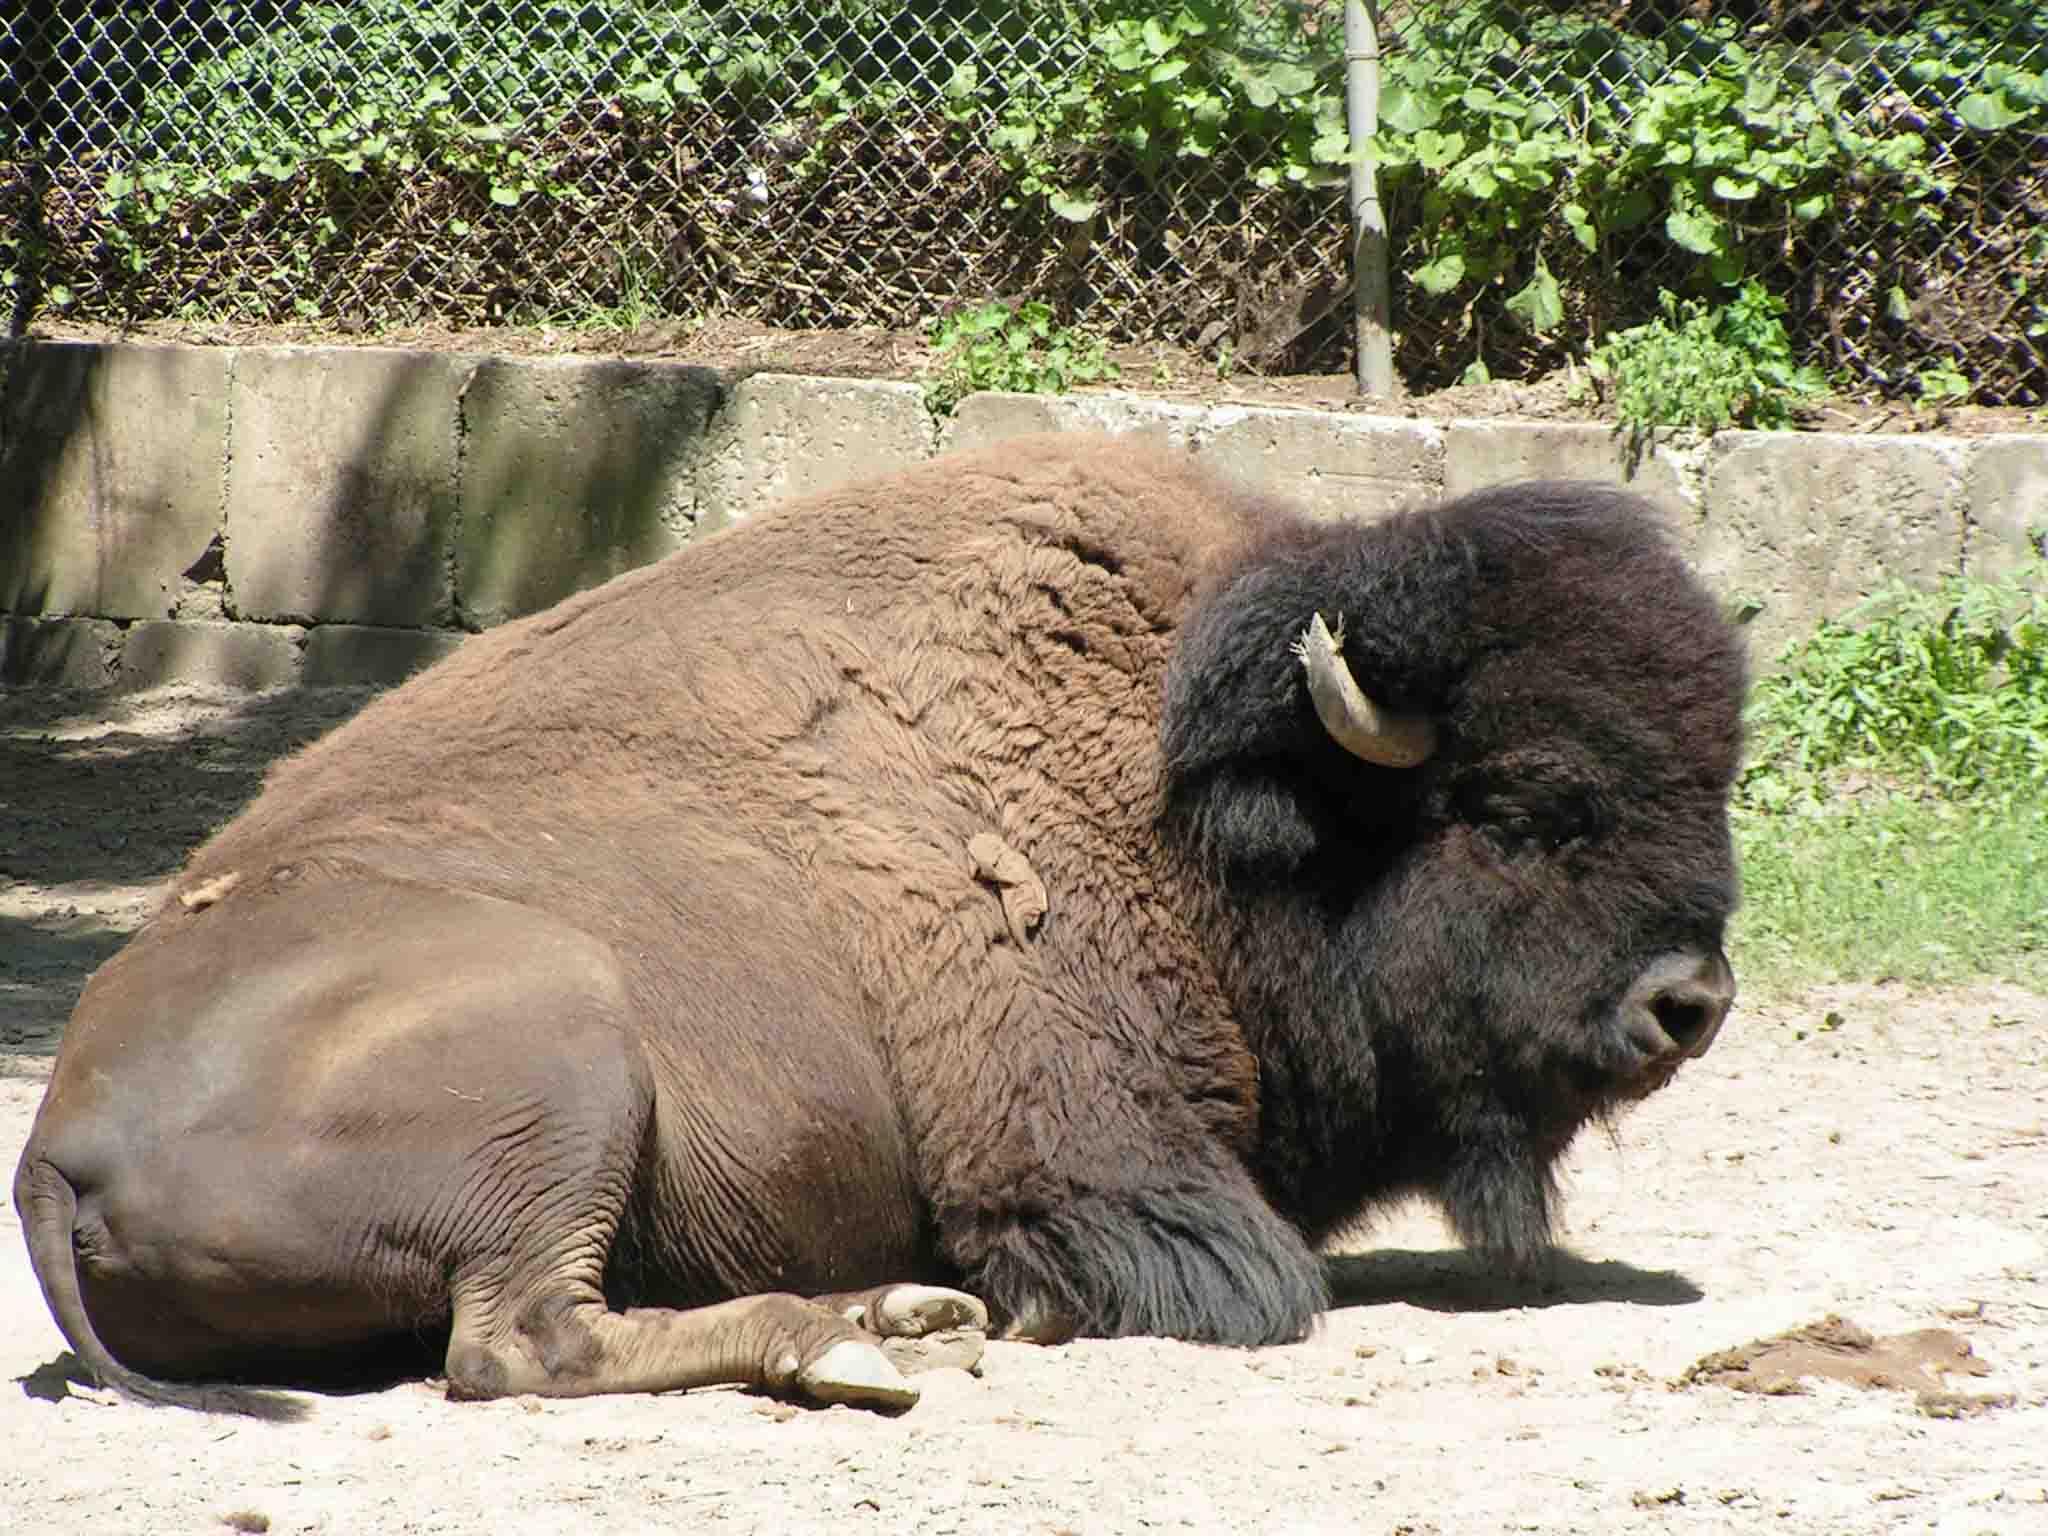 toronto_zoo_bison.jpg